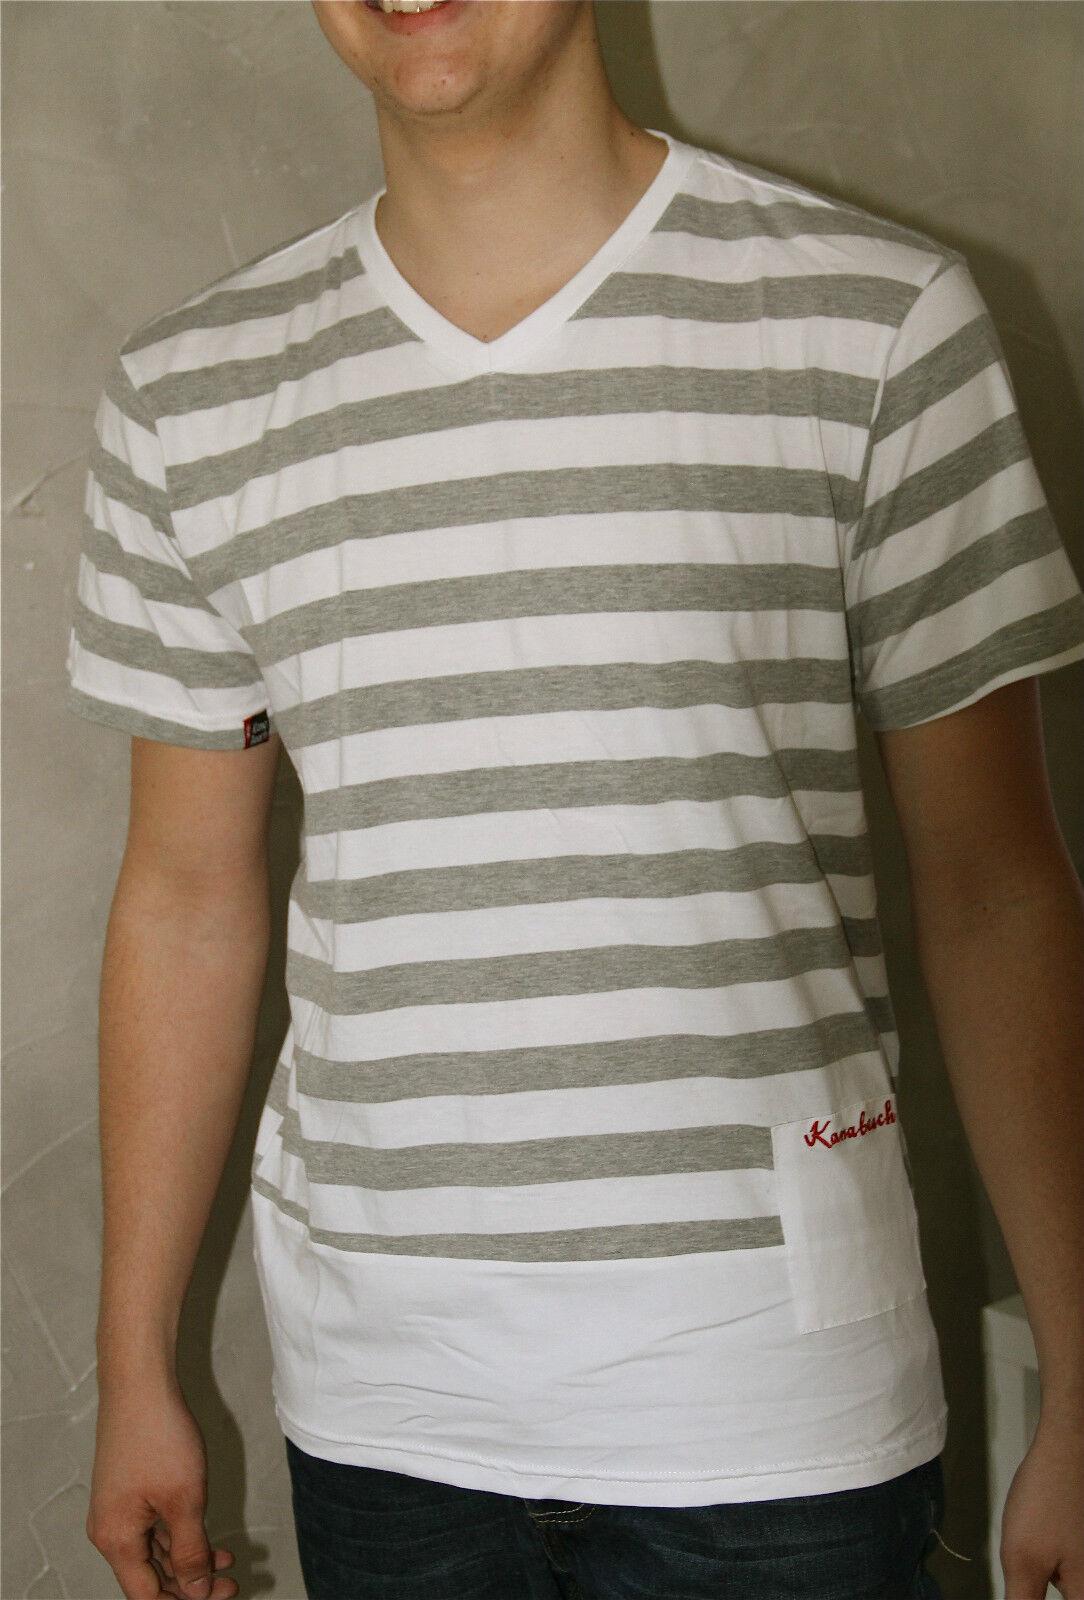 T-shirt KANABEACH bini-pk SIZE M NEW LABEL value